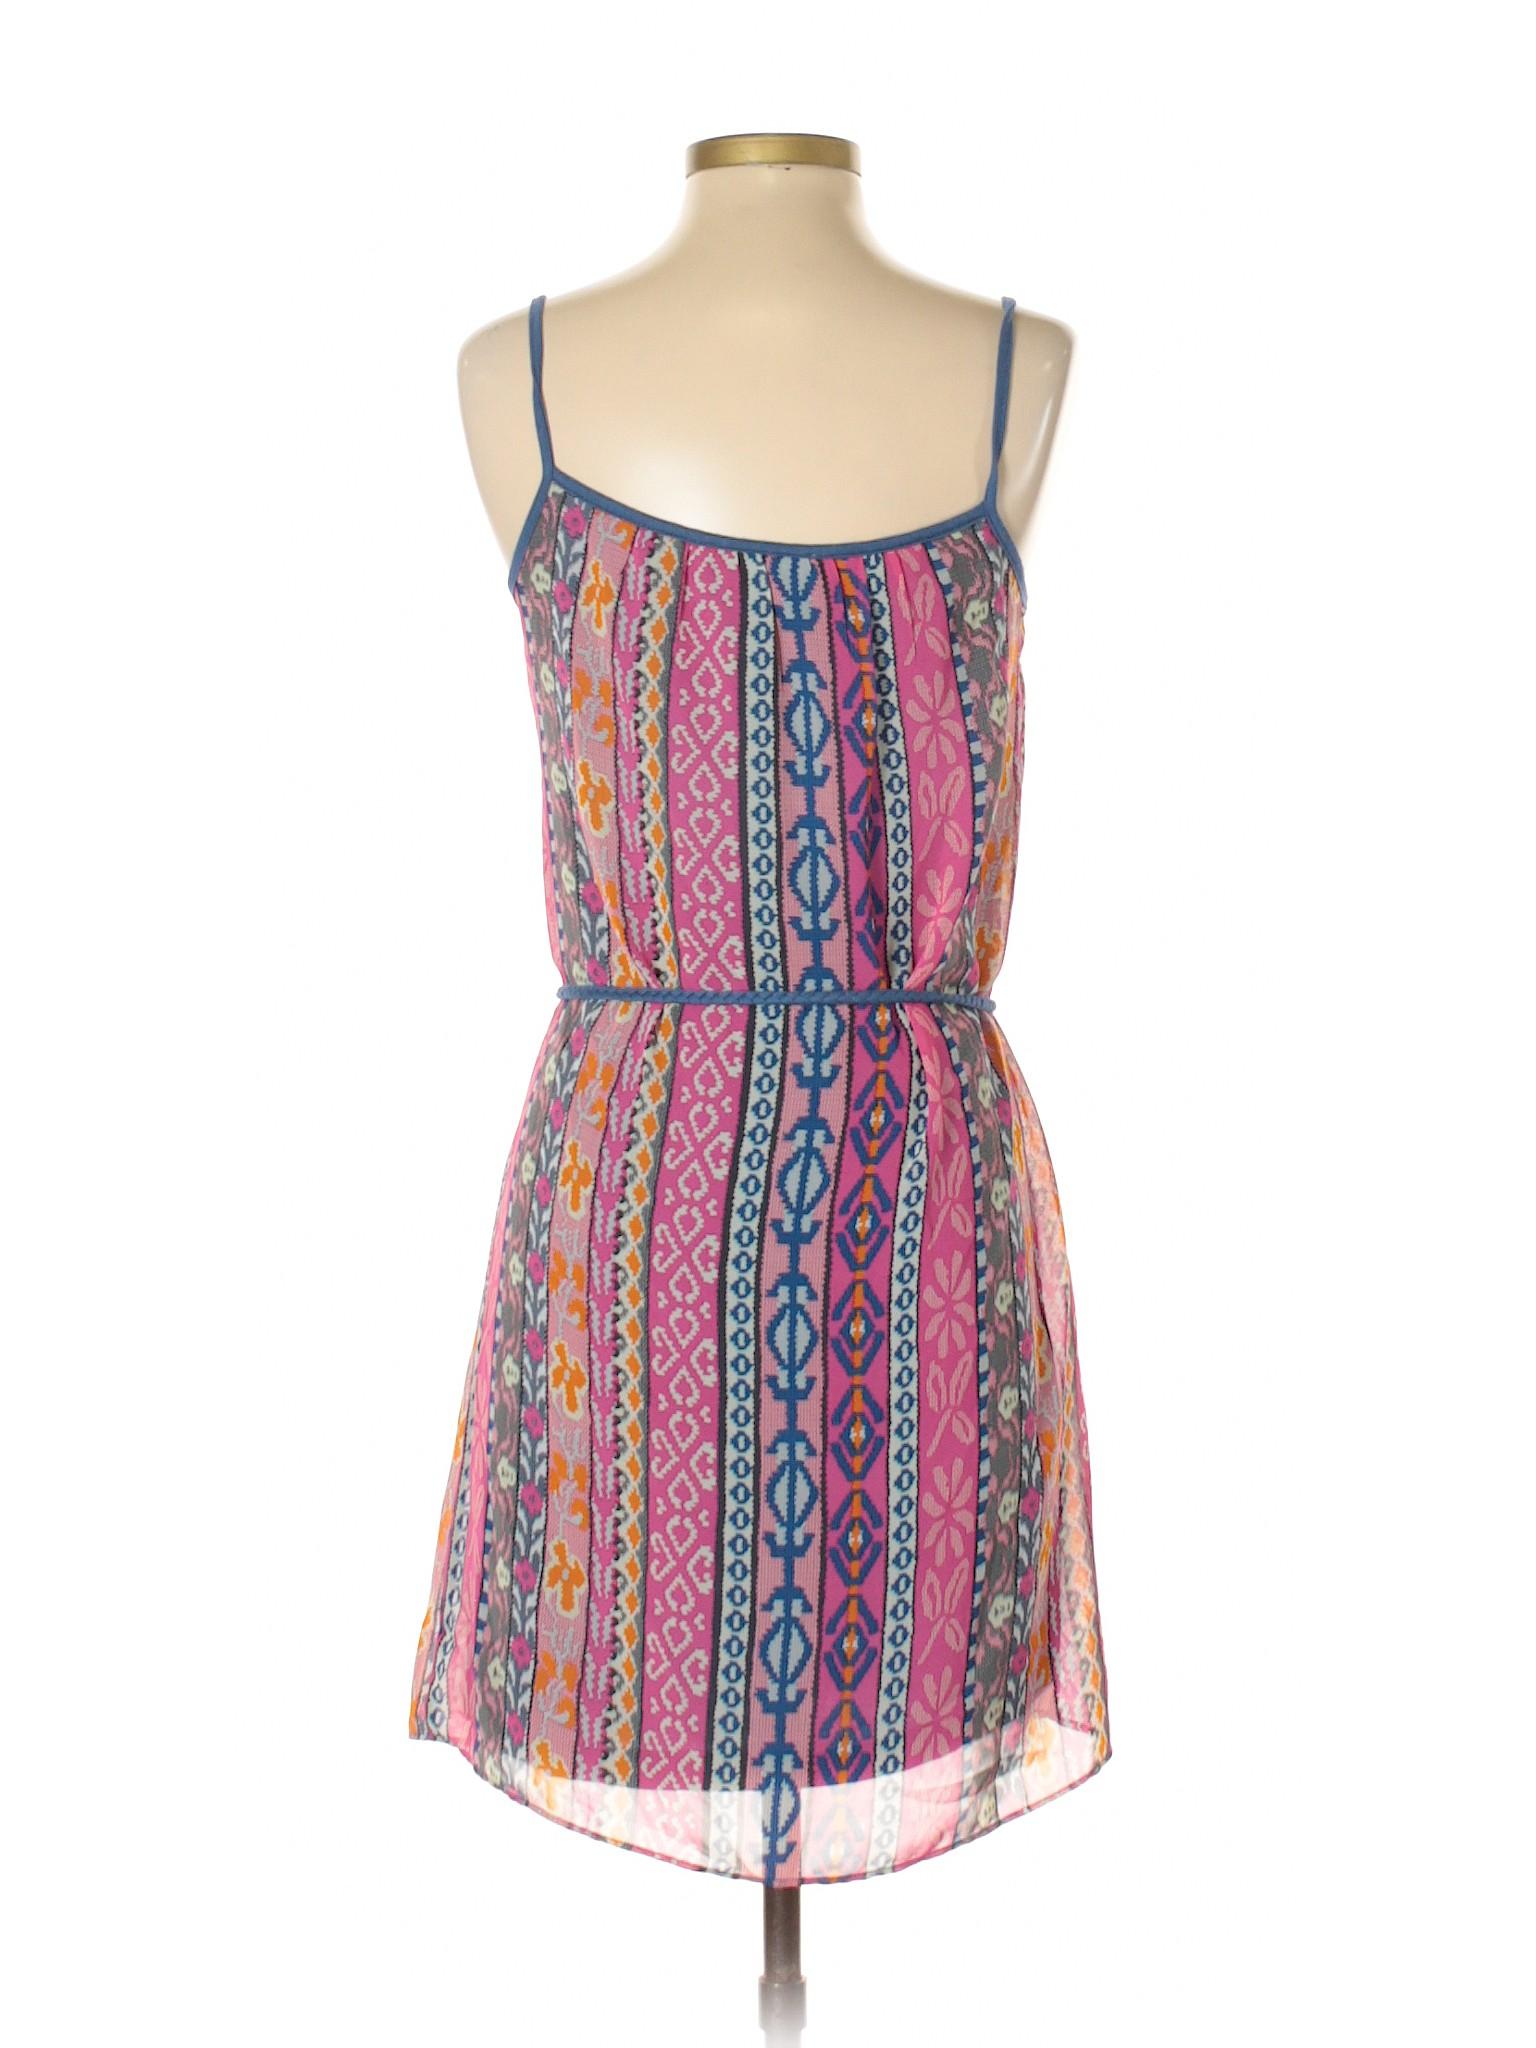 Dress Selling Selling Joy Joy Joy Joy Casual Casual q0Ap11